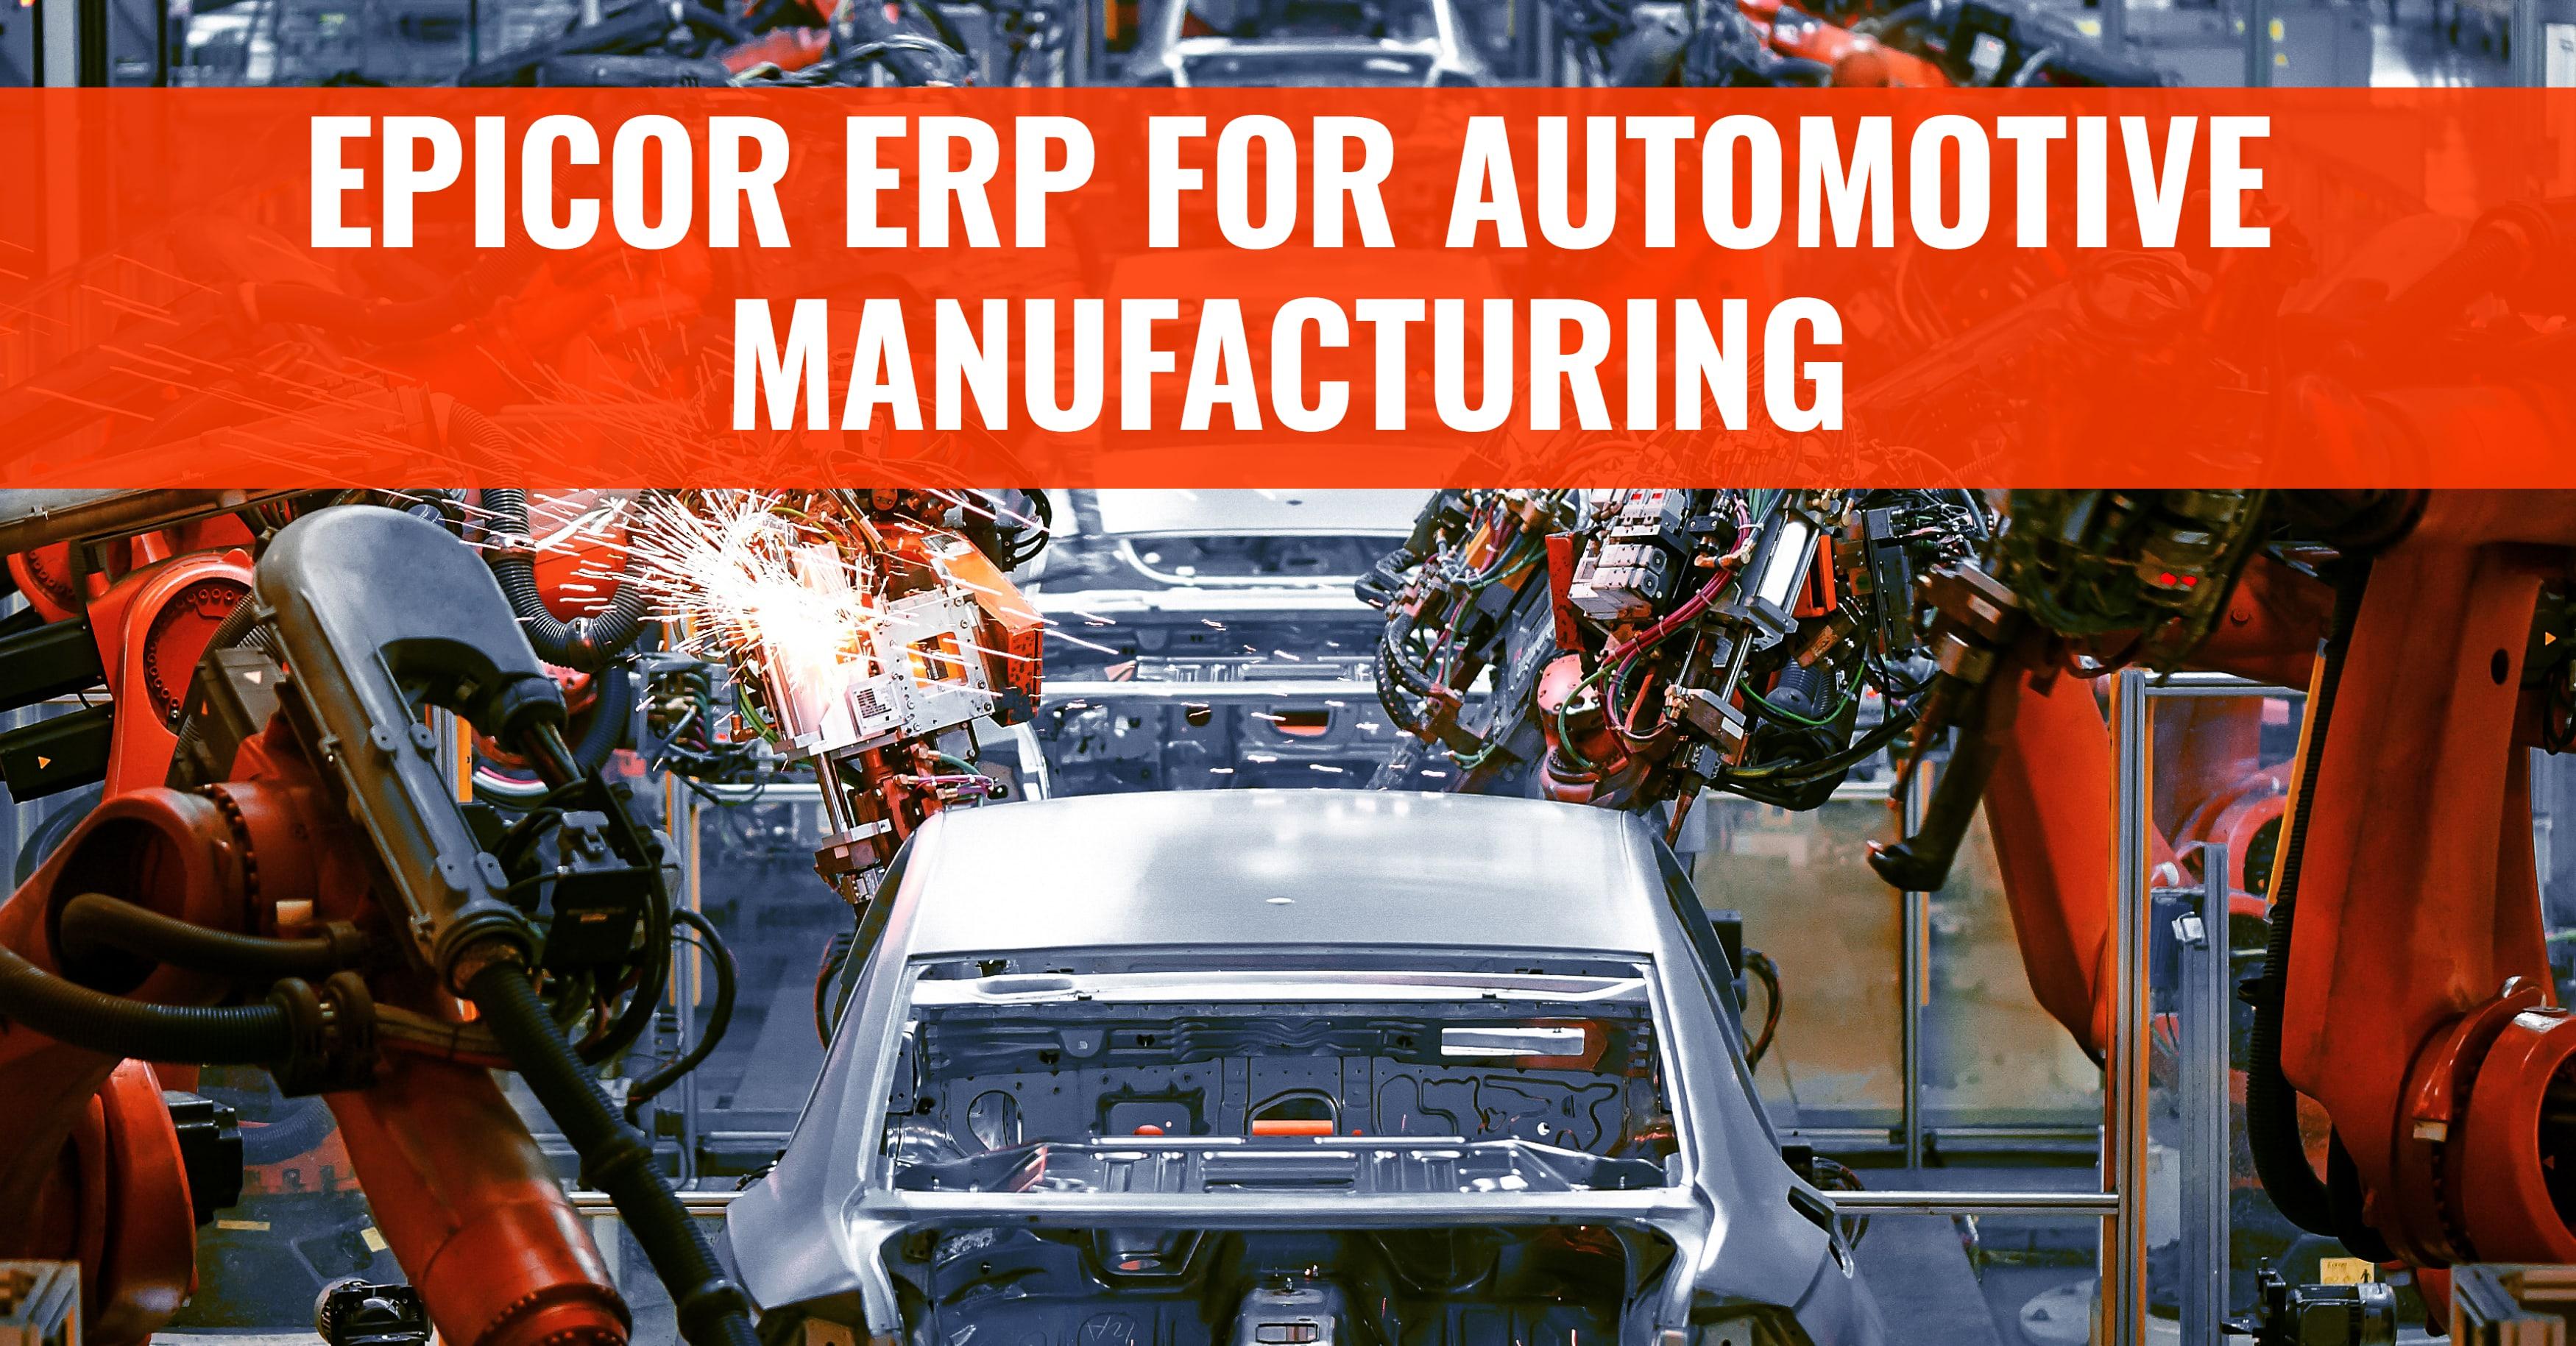 Automotive Manufacturing Epicor ERP